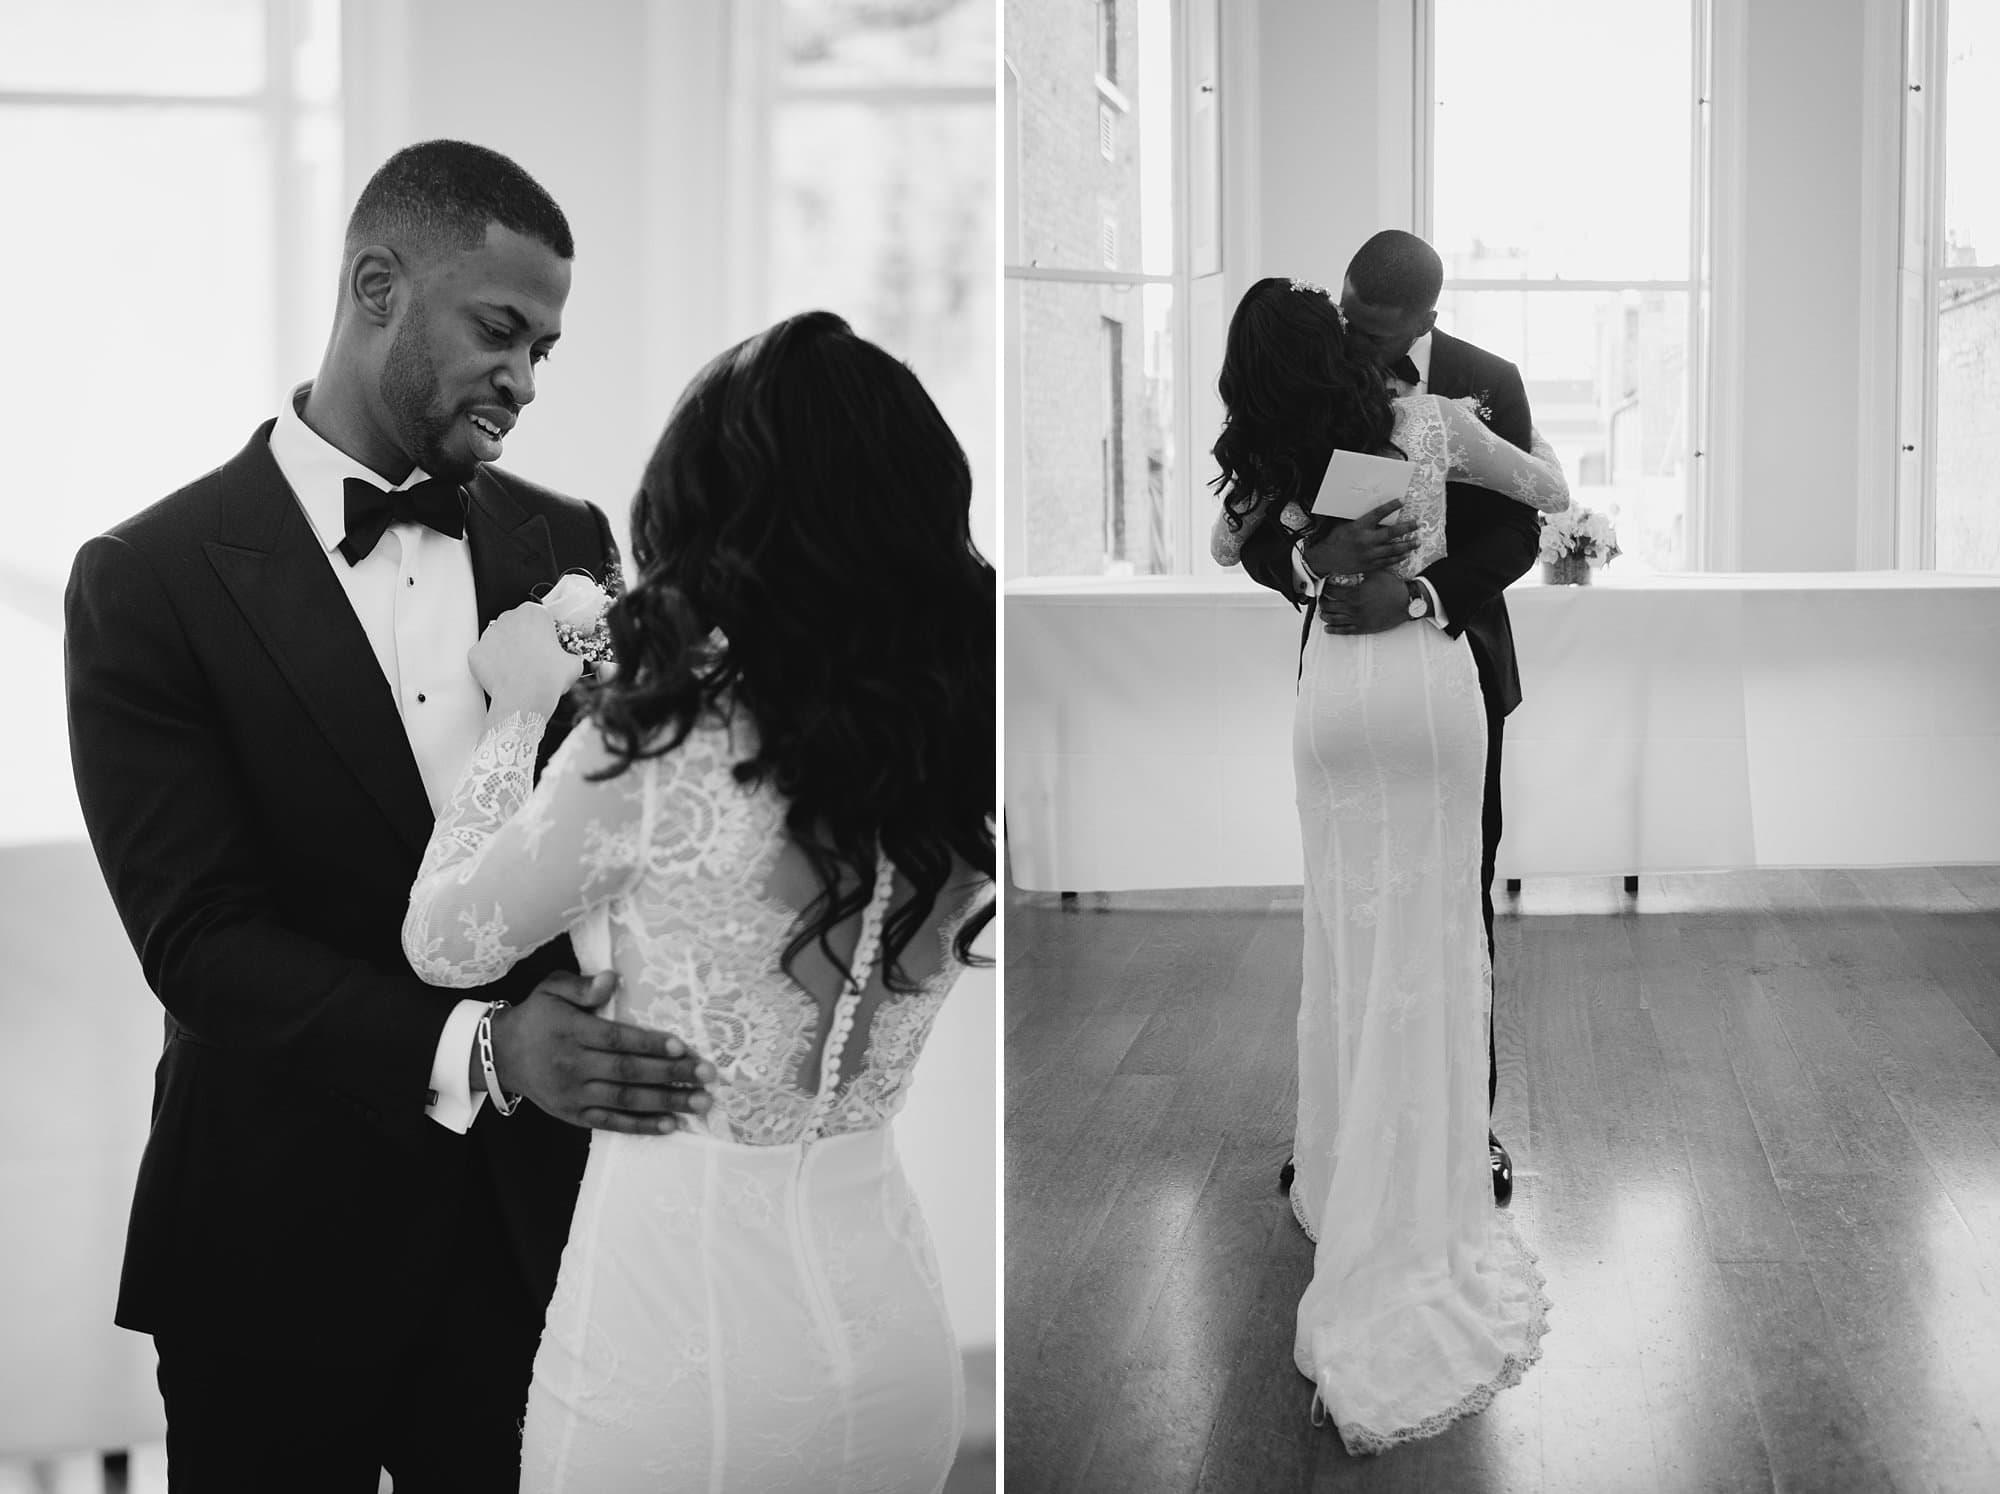 asia house london wedding photographer 006 - Rachel + Gabriel   Asia House Wedding Photography